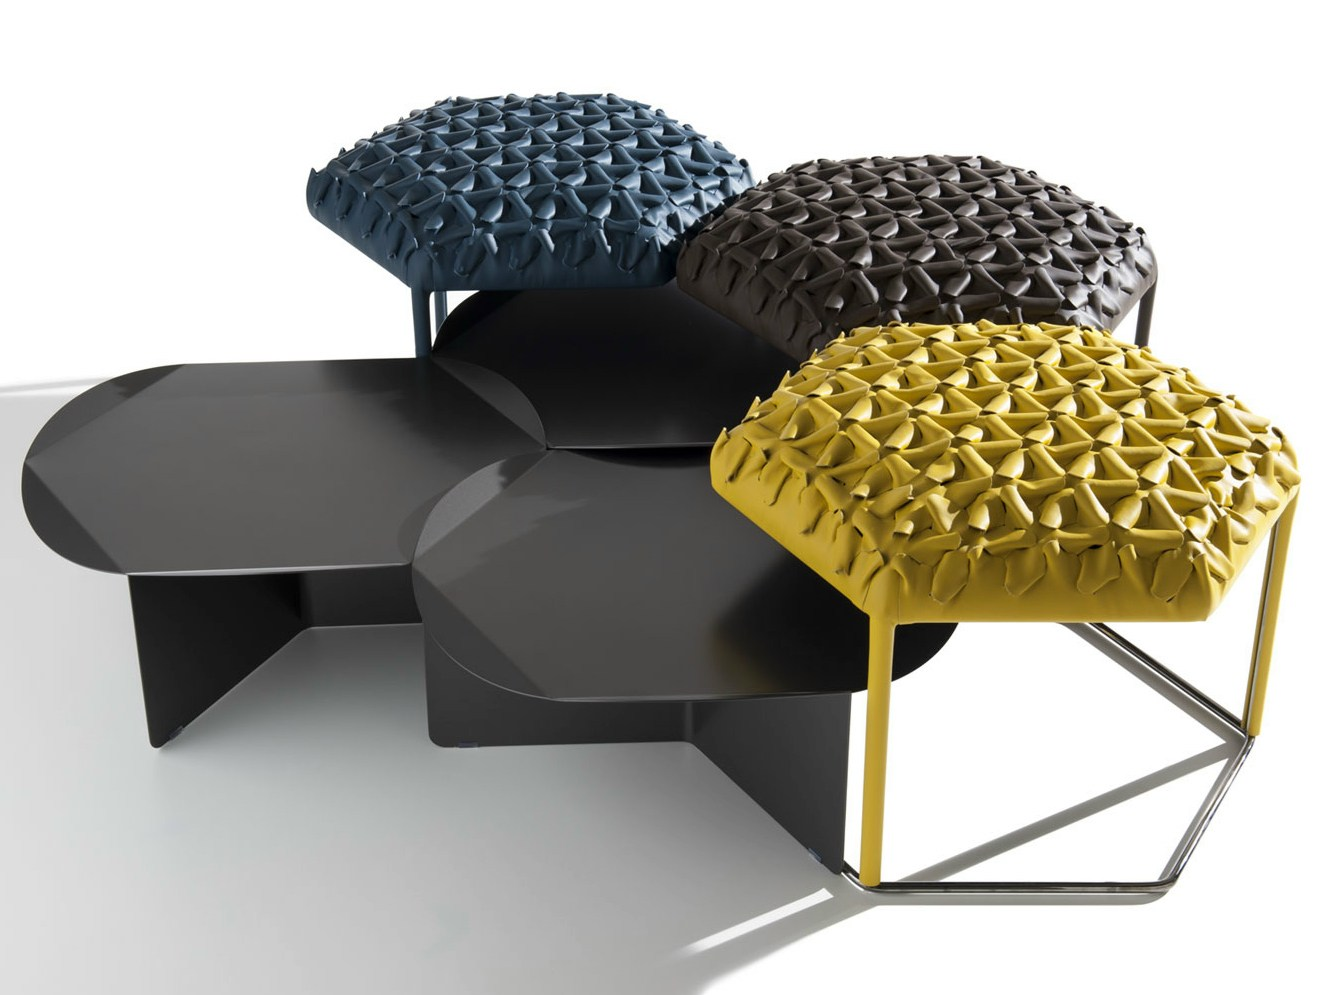 pouf coffee table hive by b b italia design atelier o. Black Bedroom Furniture Sets. Home Design Ideas